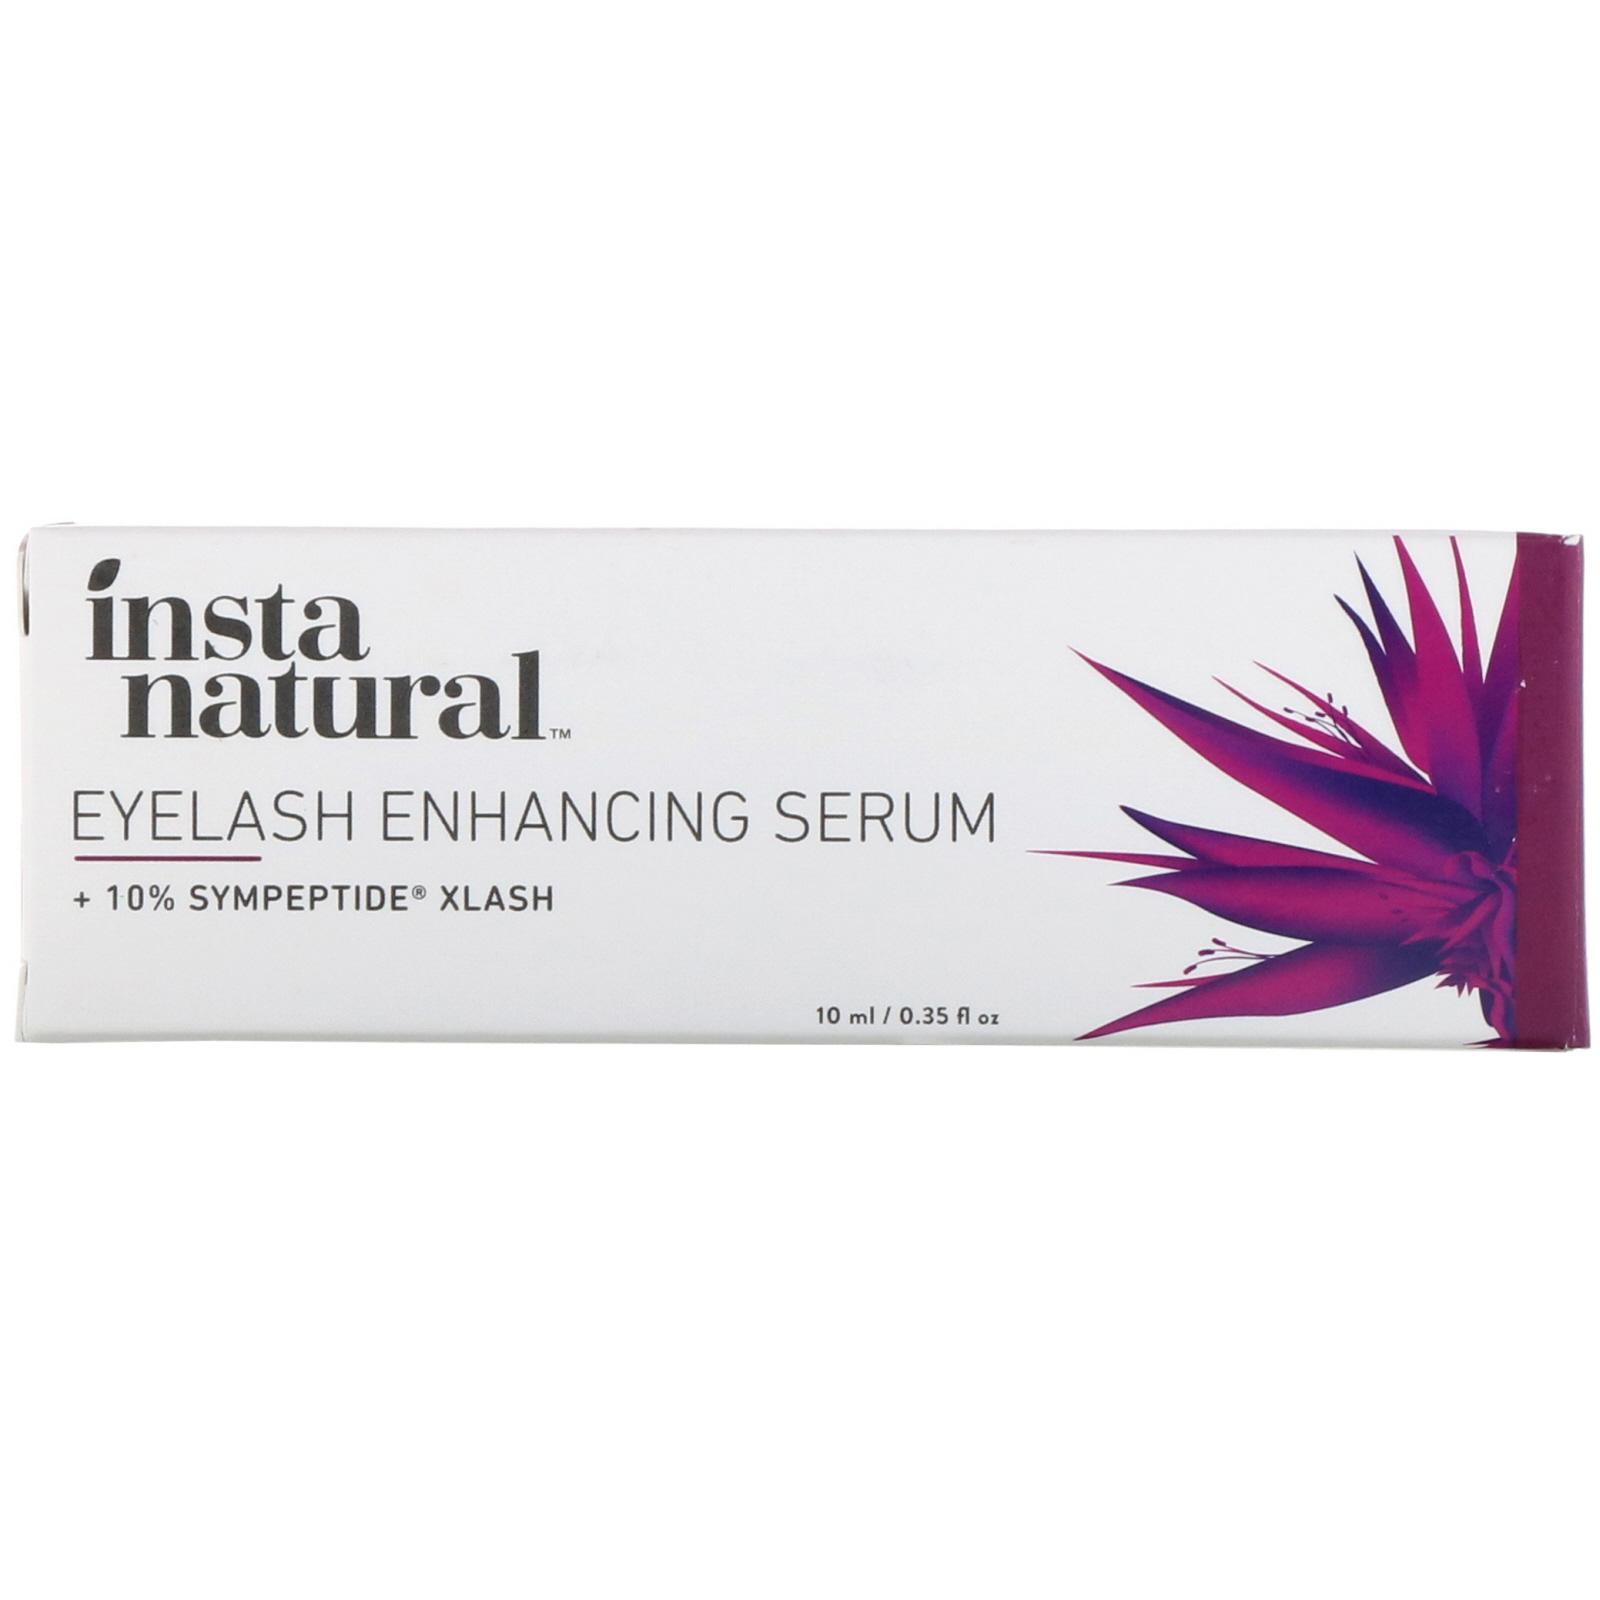 c6b9040f7f4 InstaNatural, Eyelash Enhancing Serum, 0.35 fl oz (10 ml). By InstaNatural